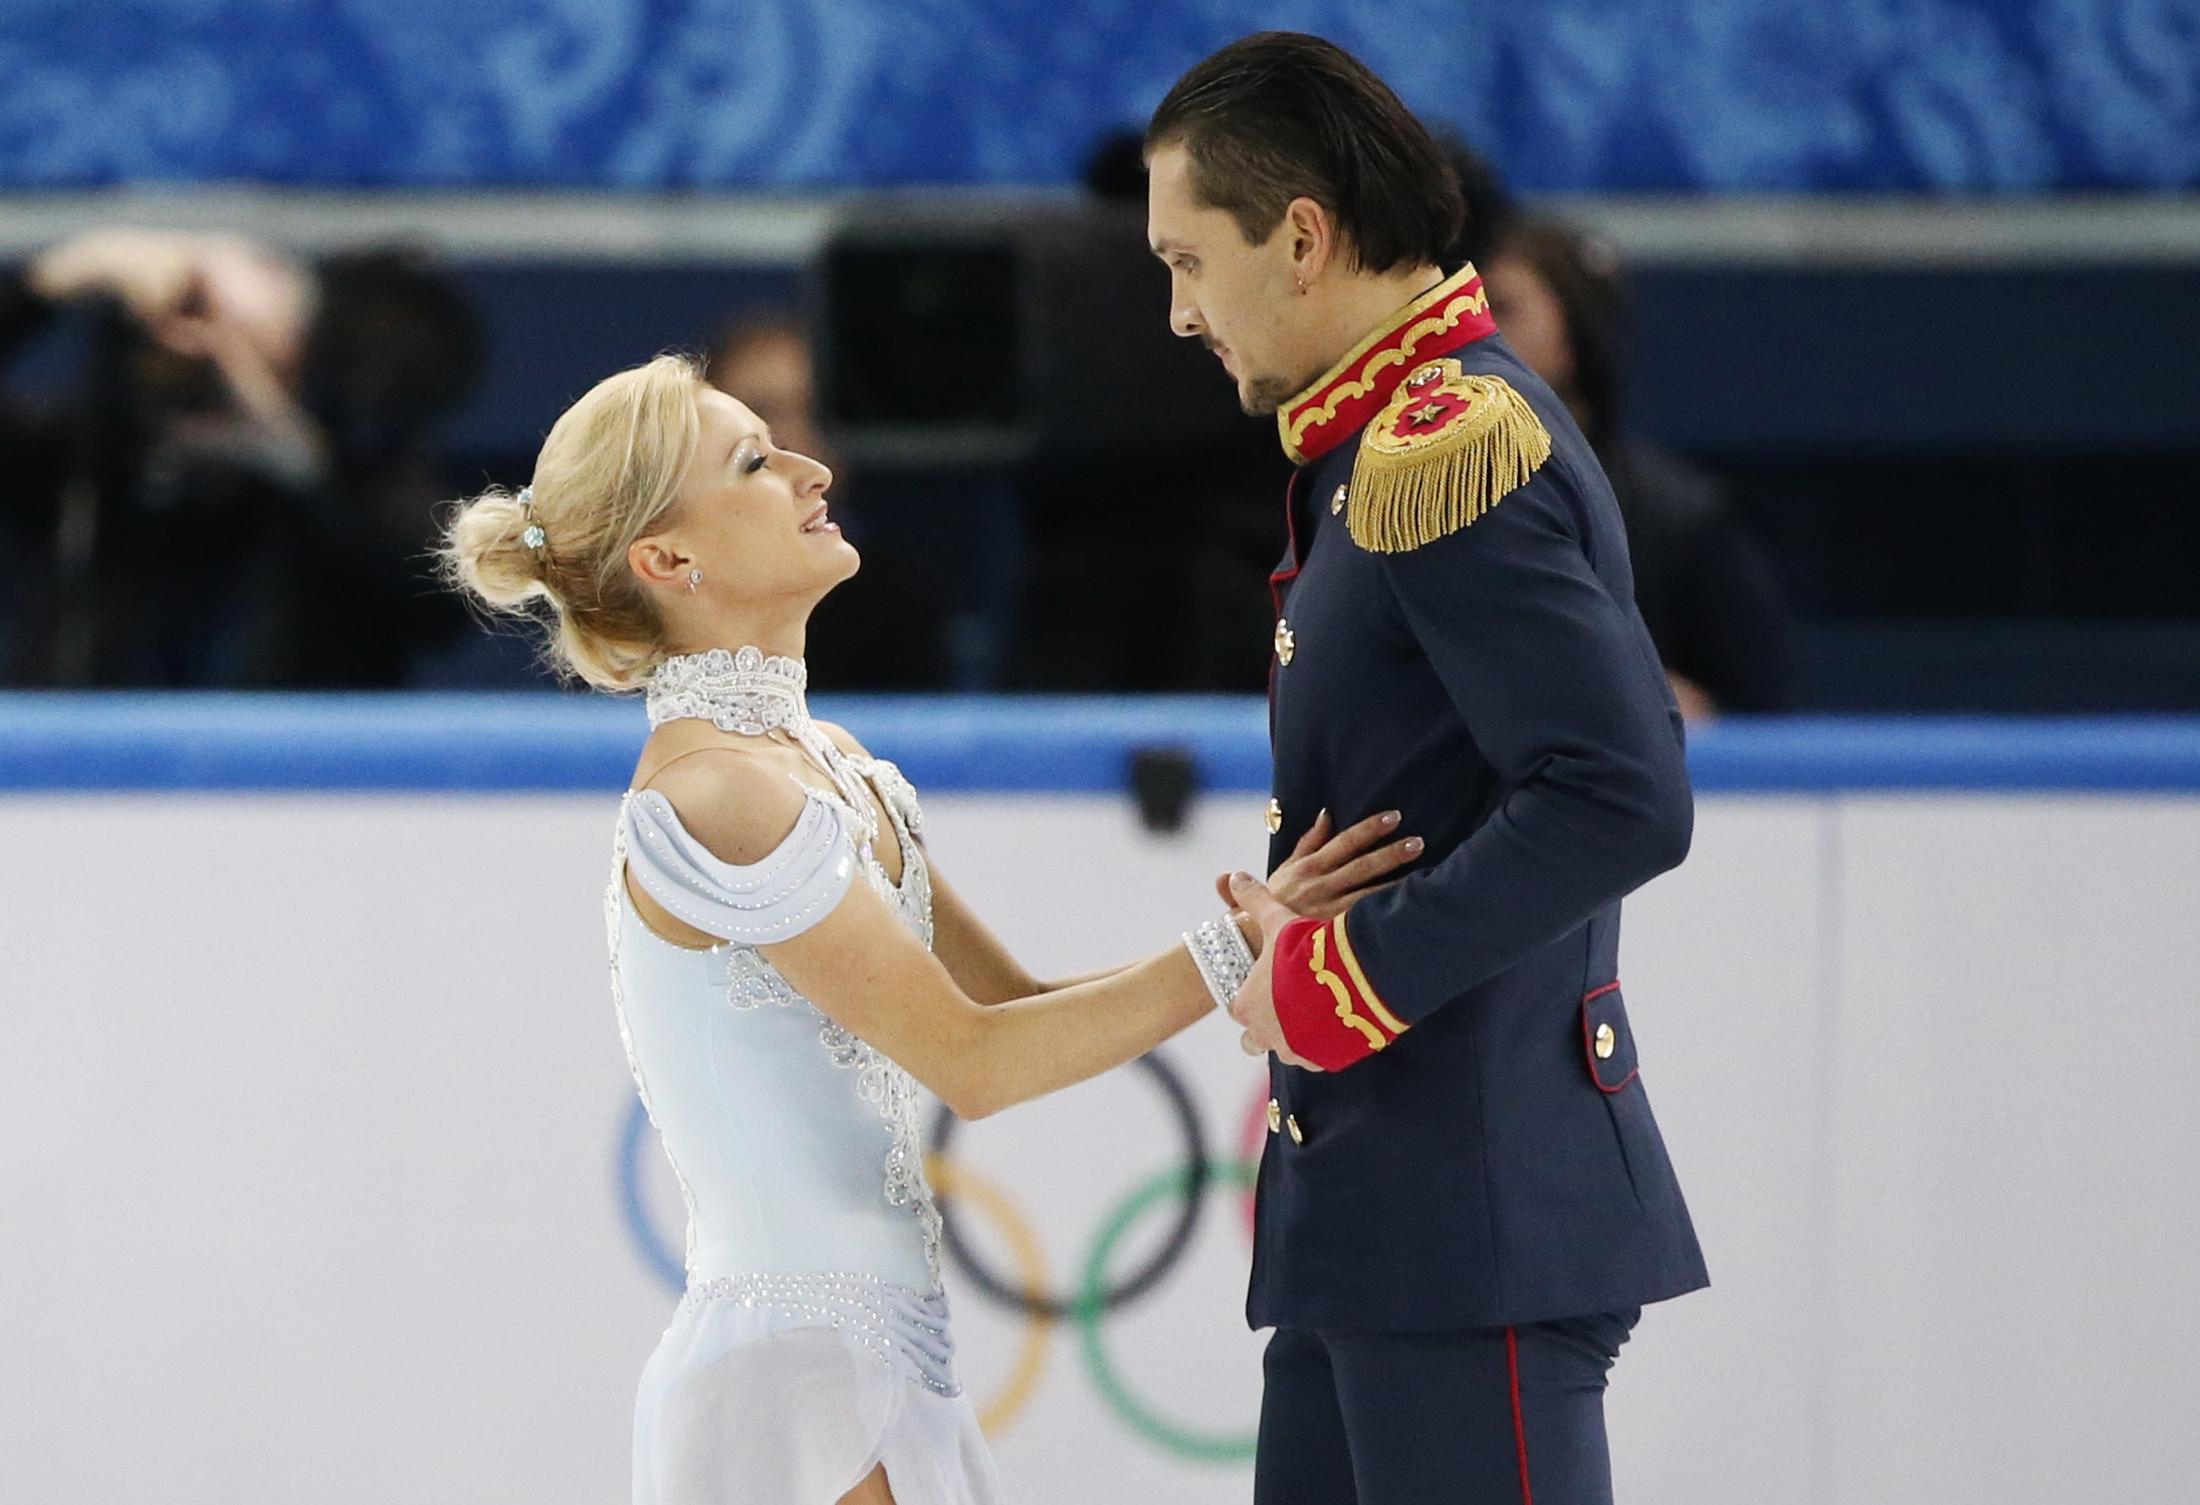 maxim trankov dating tatiana Tanja klimenko more:    tatiana volosozhar and maxim trankov of russia compete in the figure skating pairs.